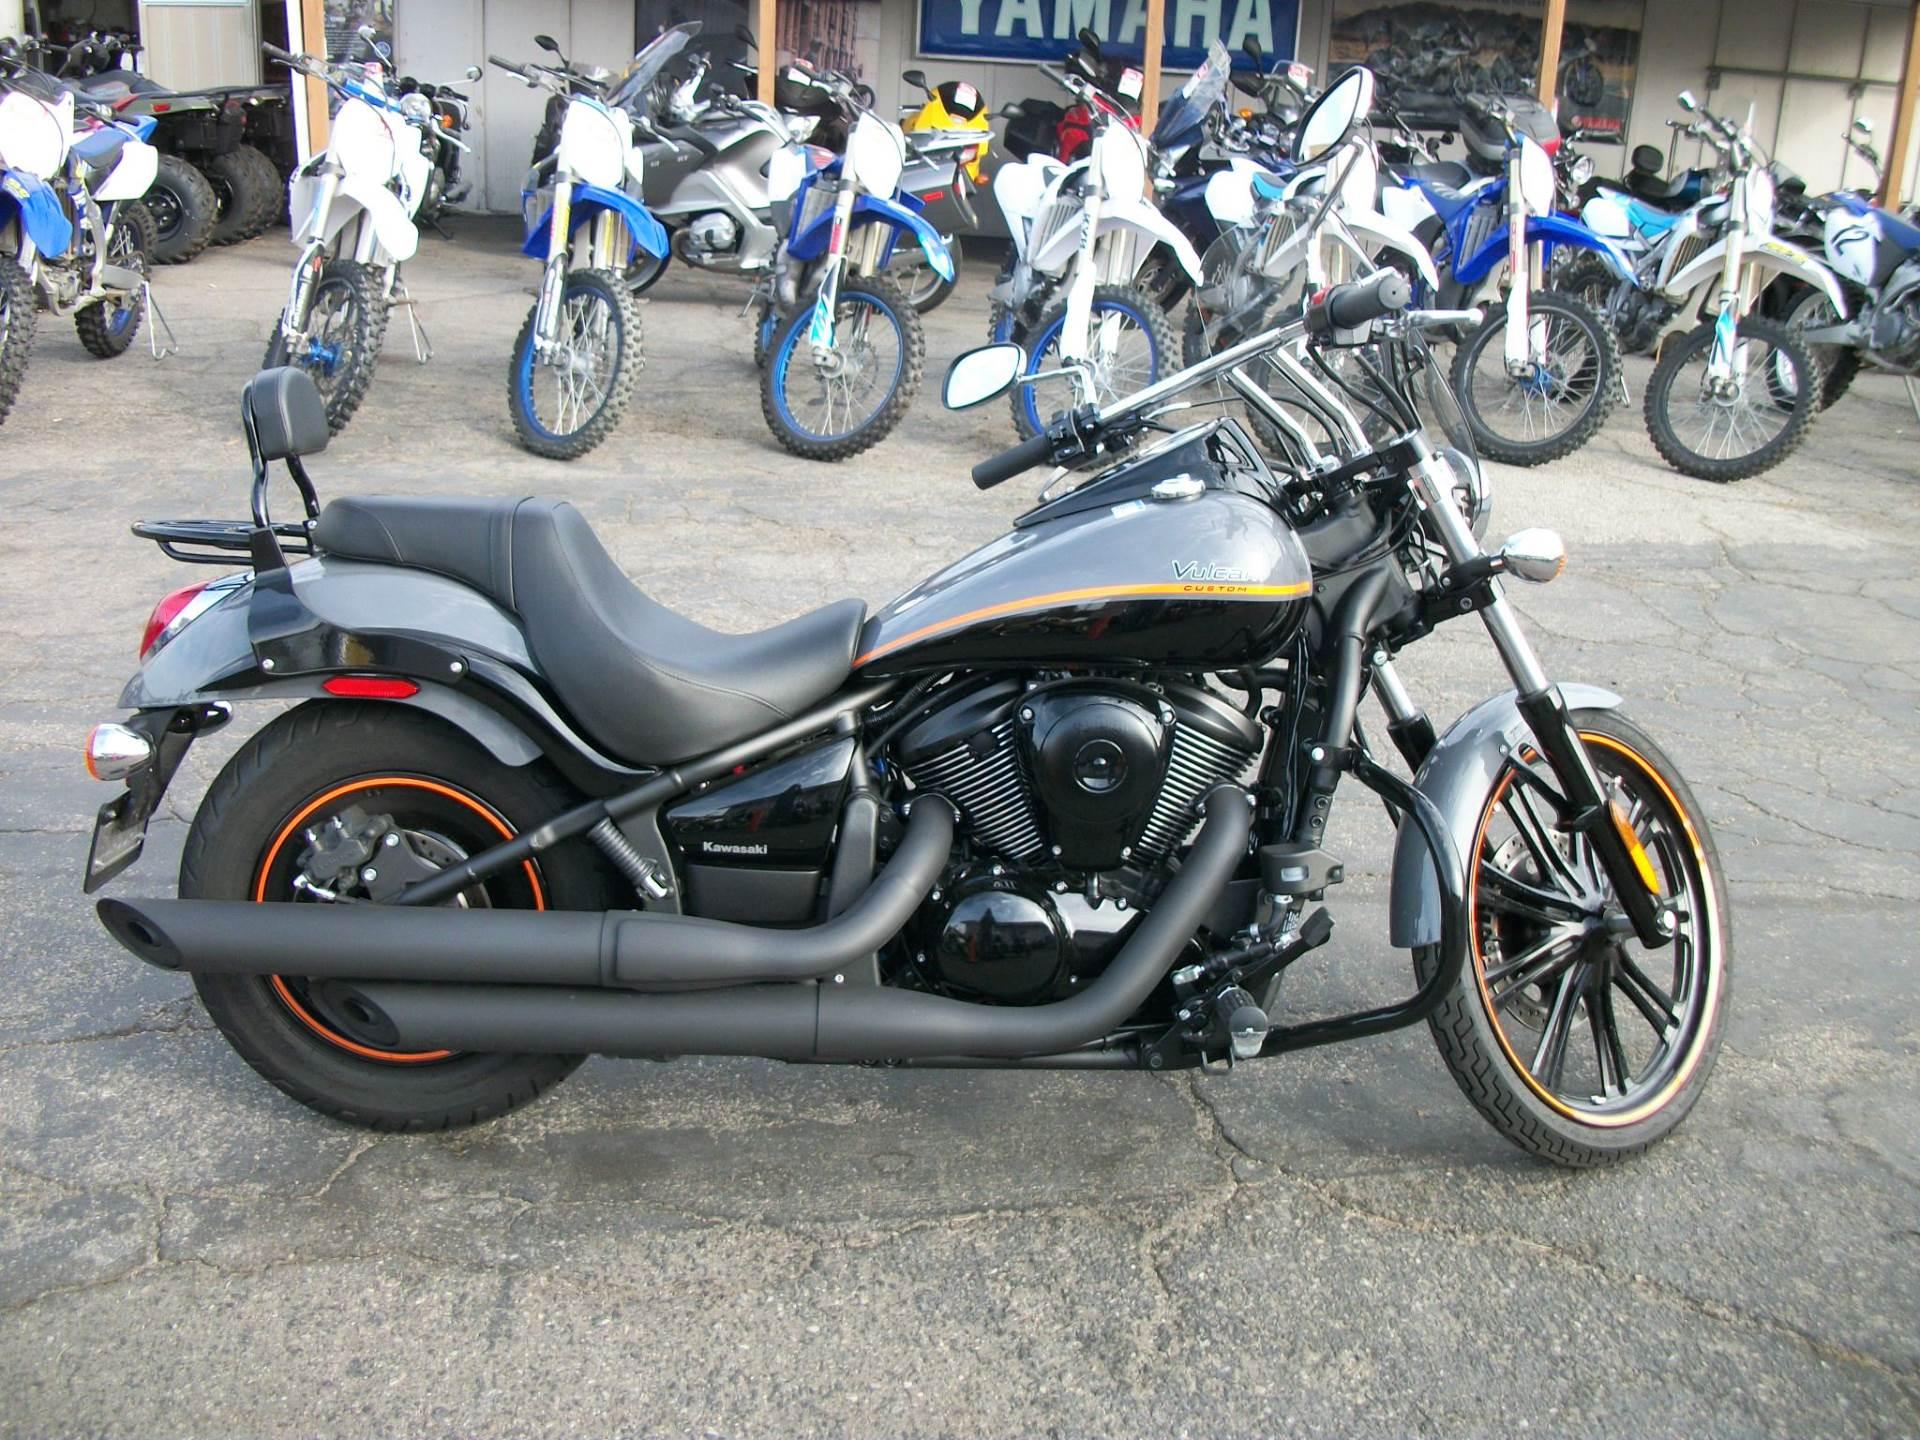 Kawasaki Vulcan 900 Custom >> 2019 Kawasaki Vulcan 900 Custom In Simi Valley California